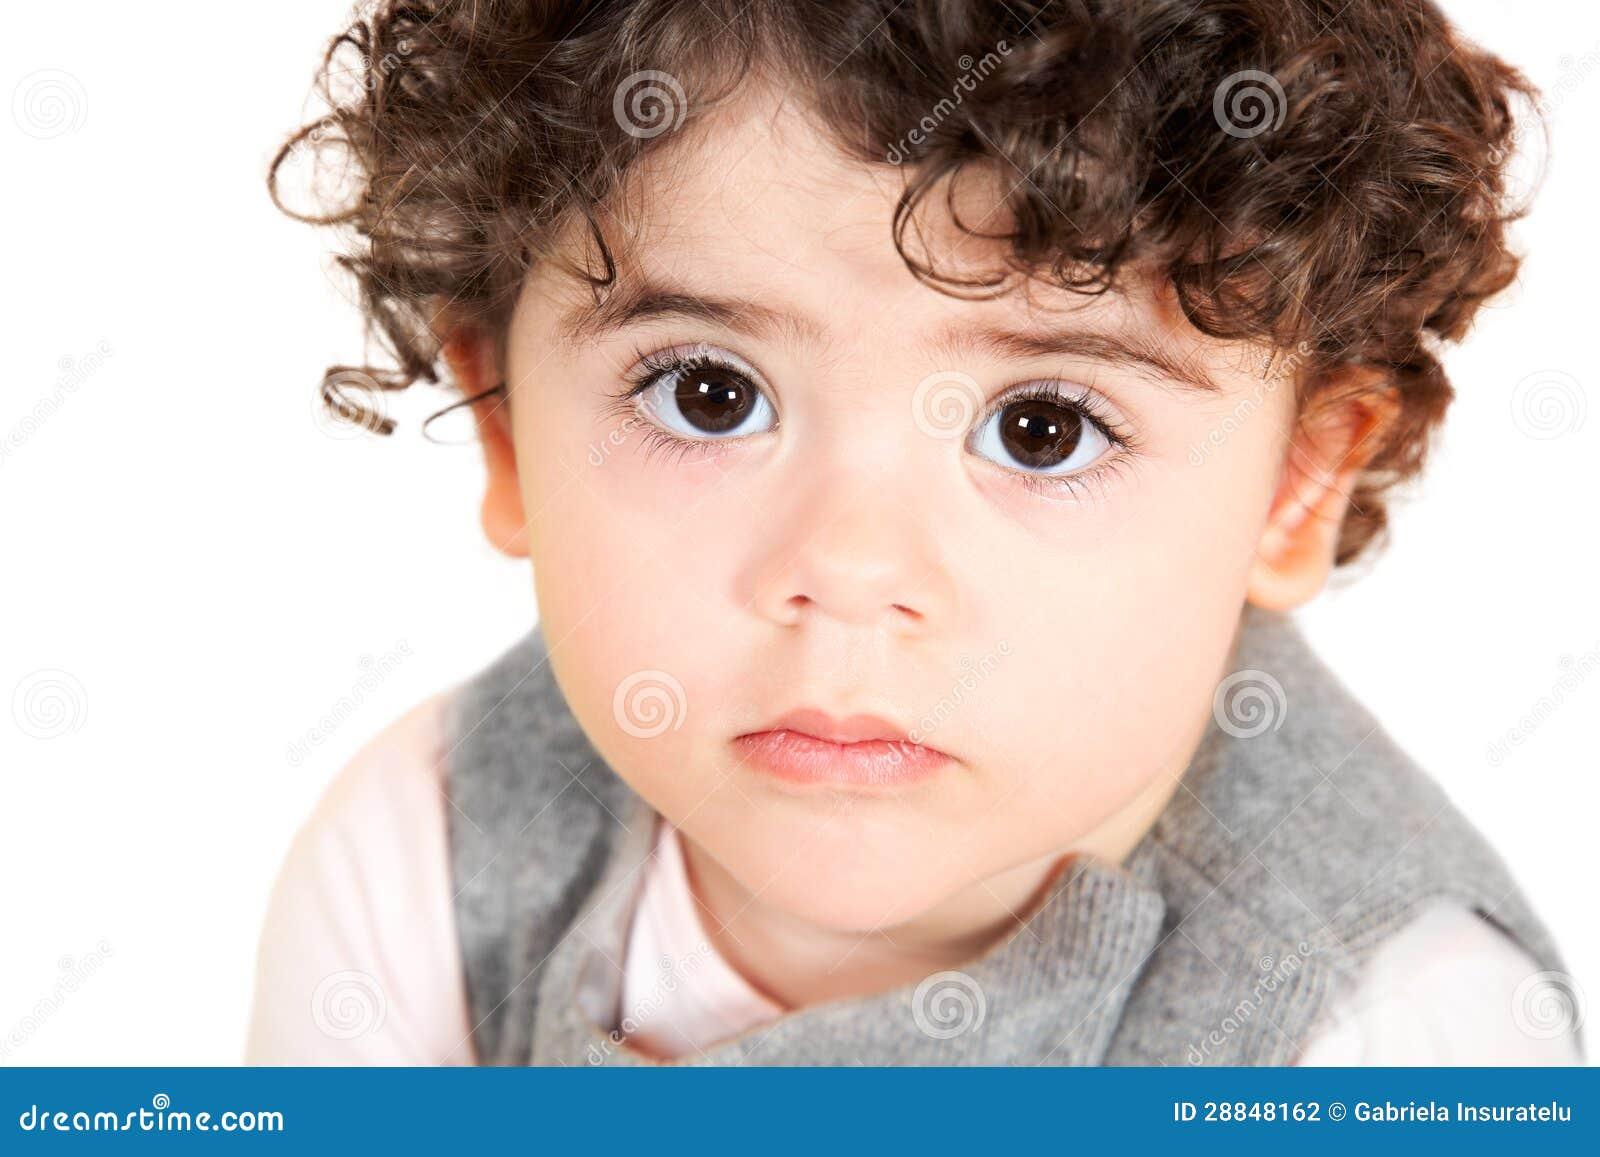 Baby Girl Portrait Stock Photography Image 28848162